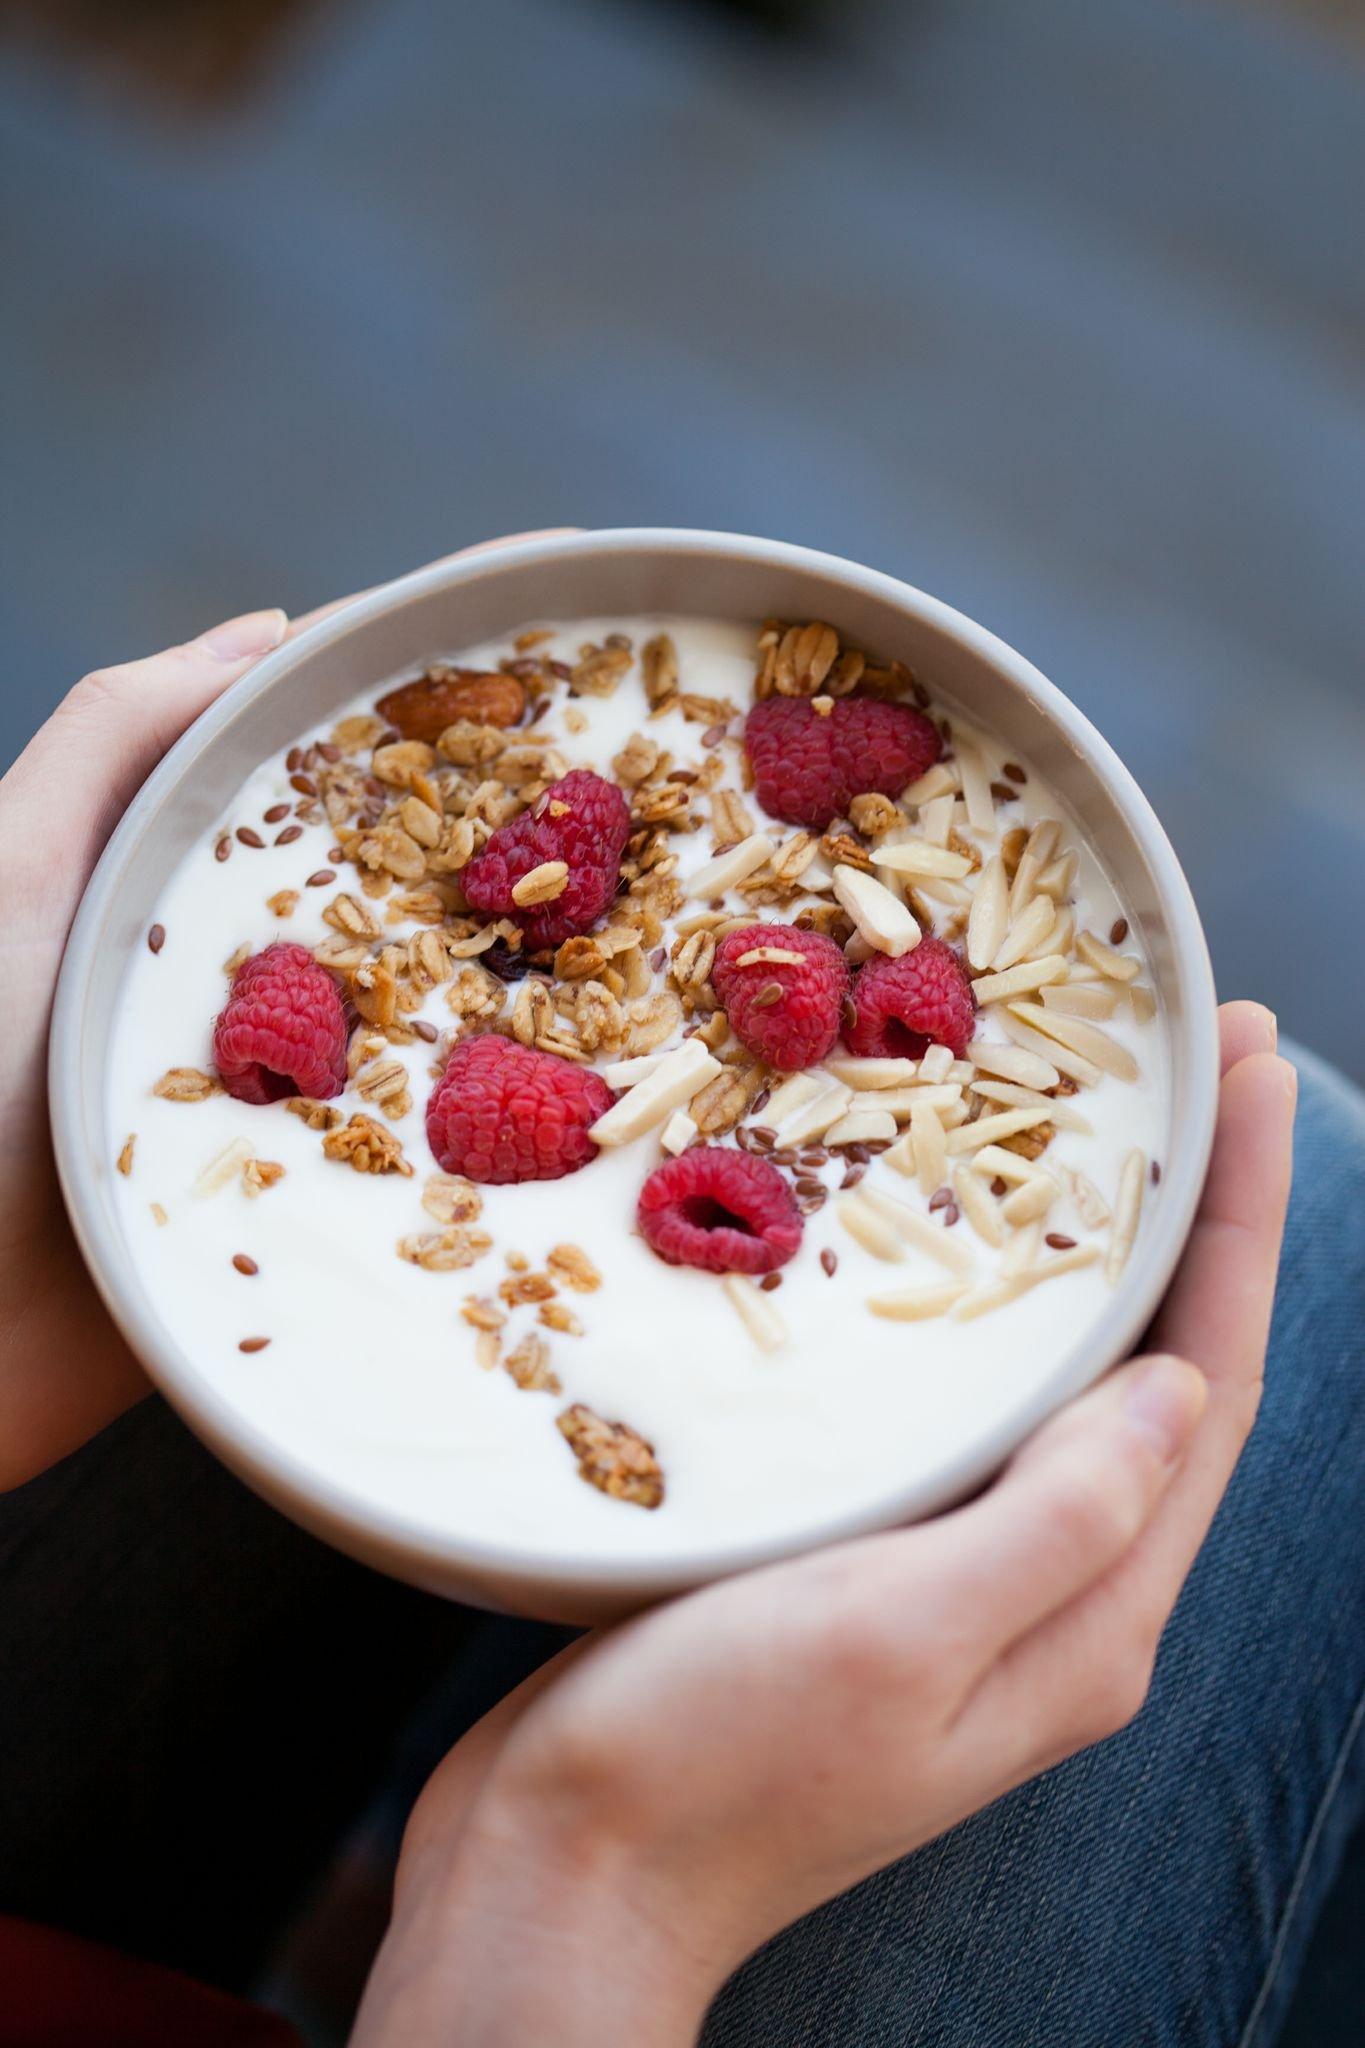 How To Make Yogurt at Home | Kitchn